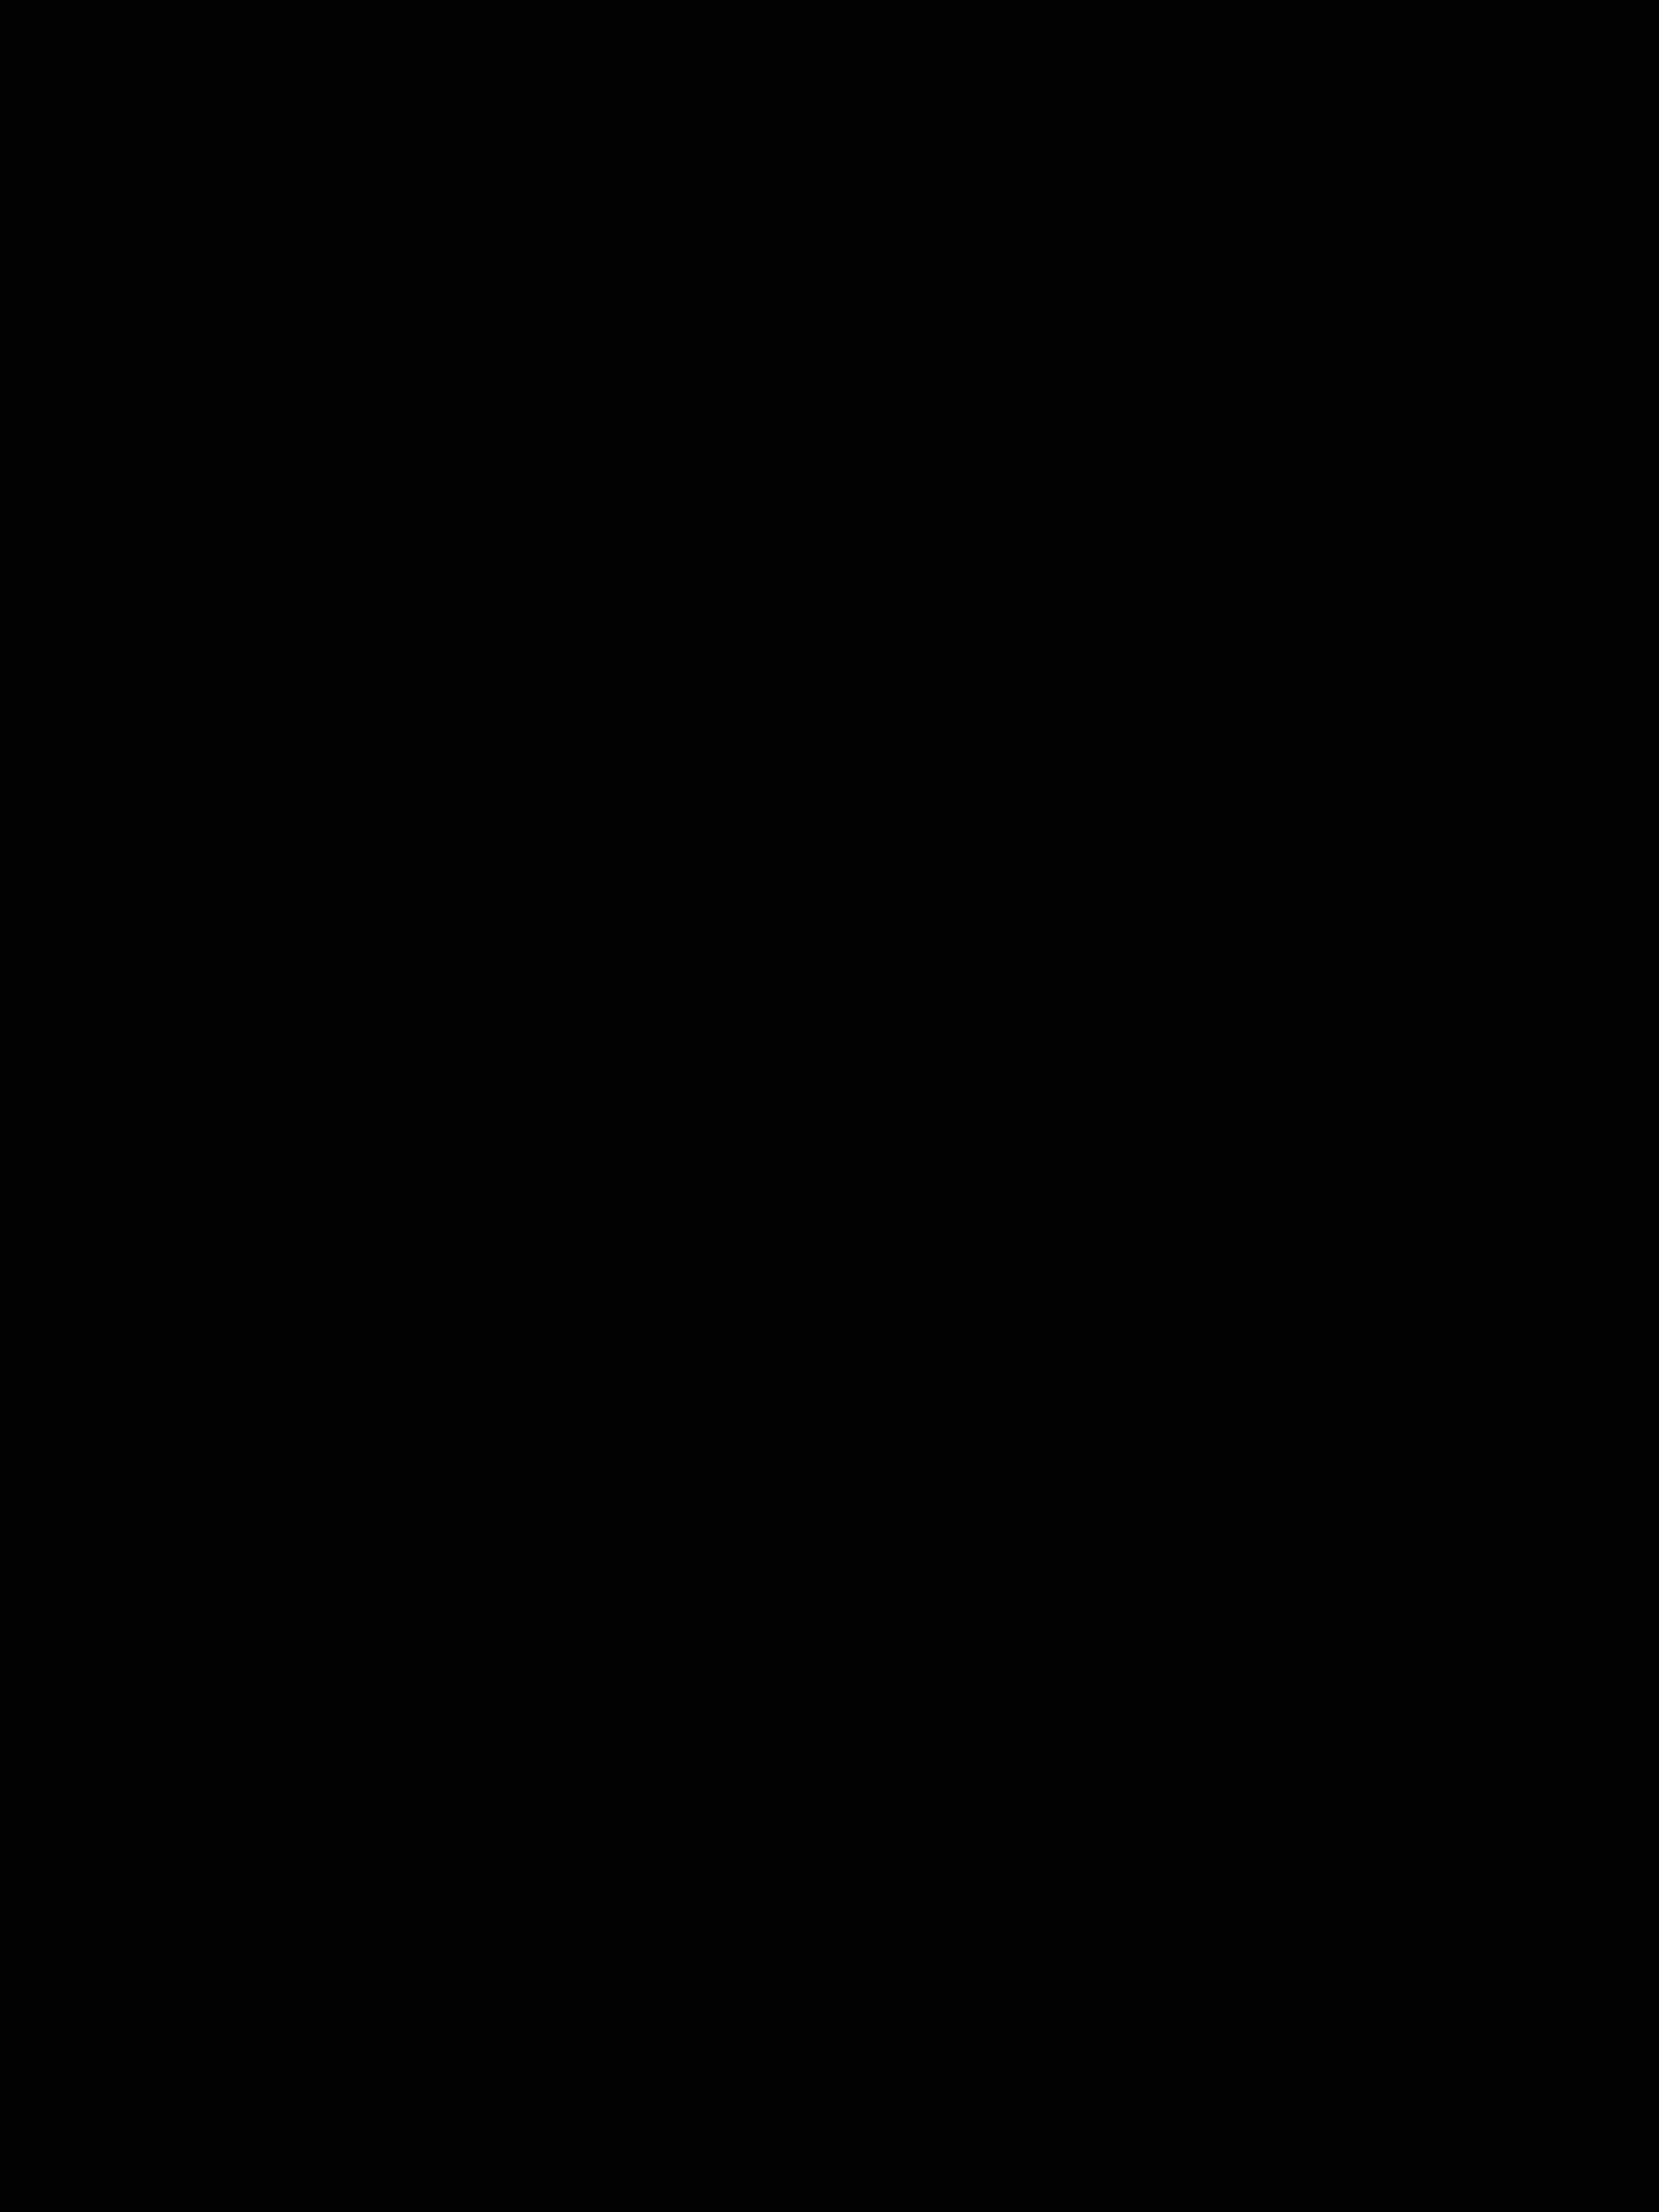 oznorWO